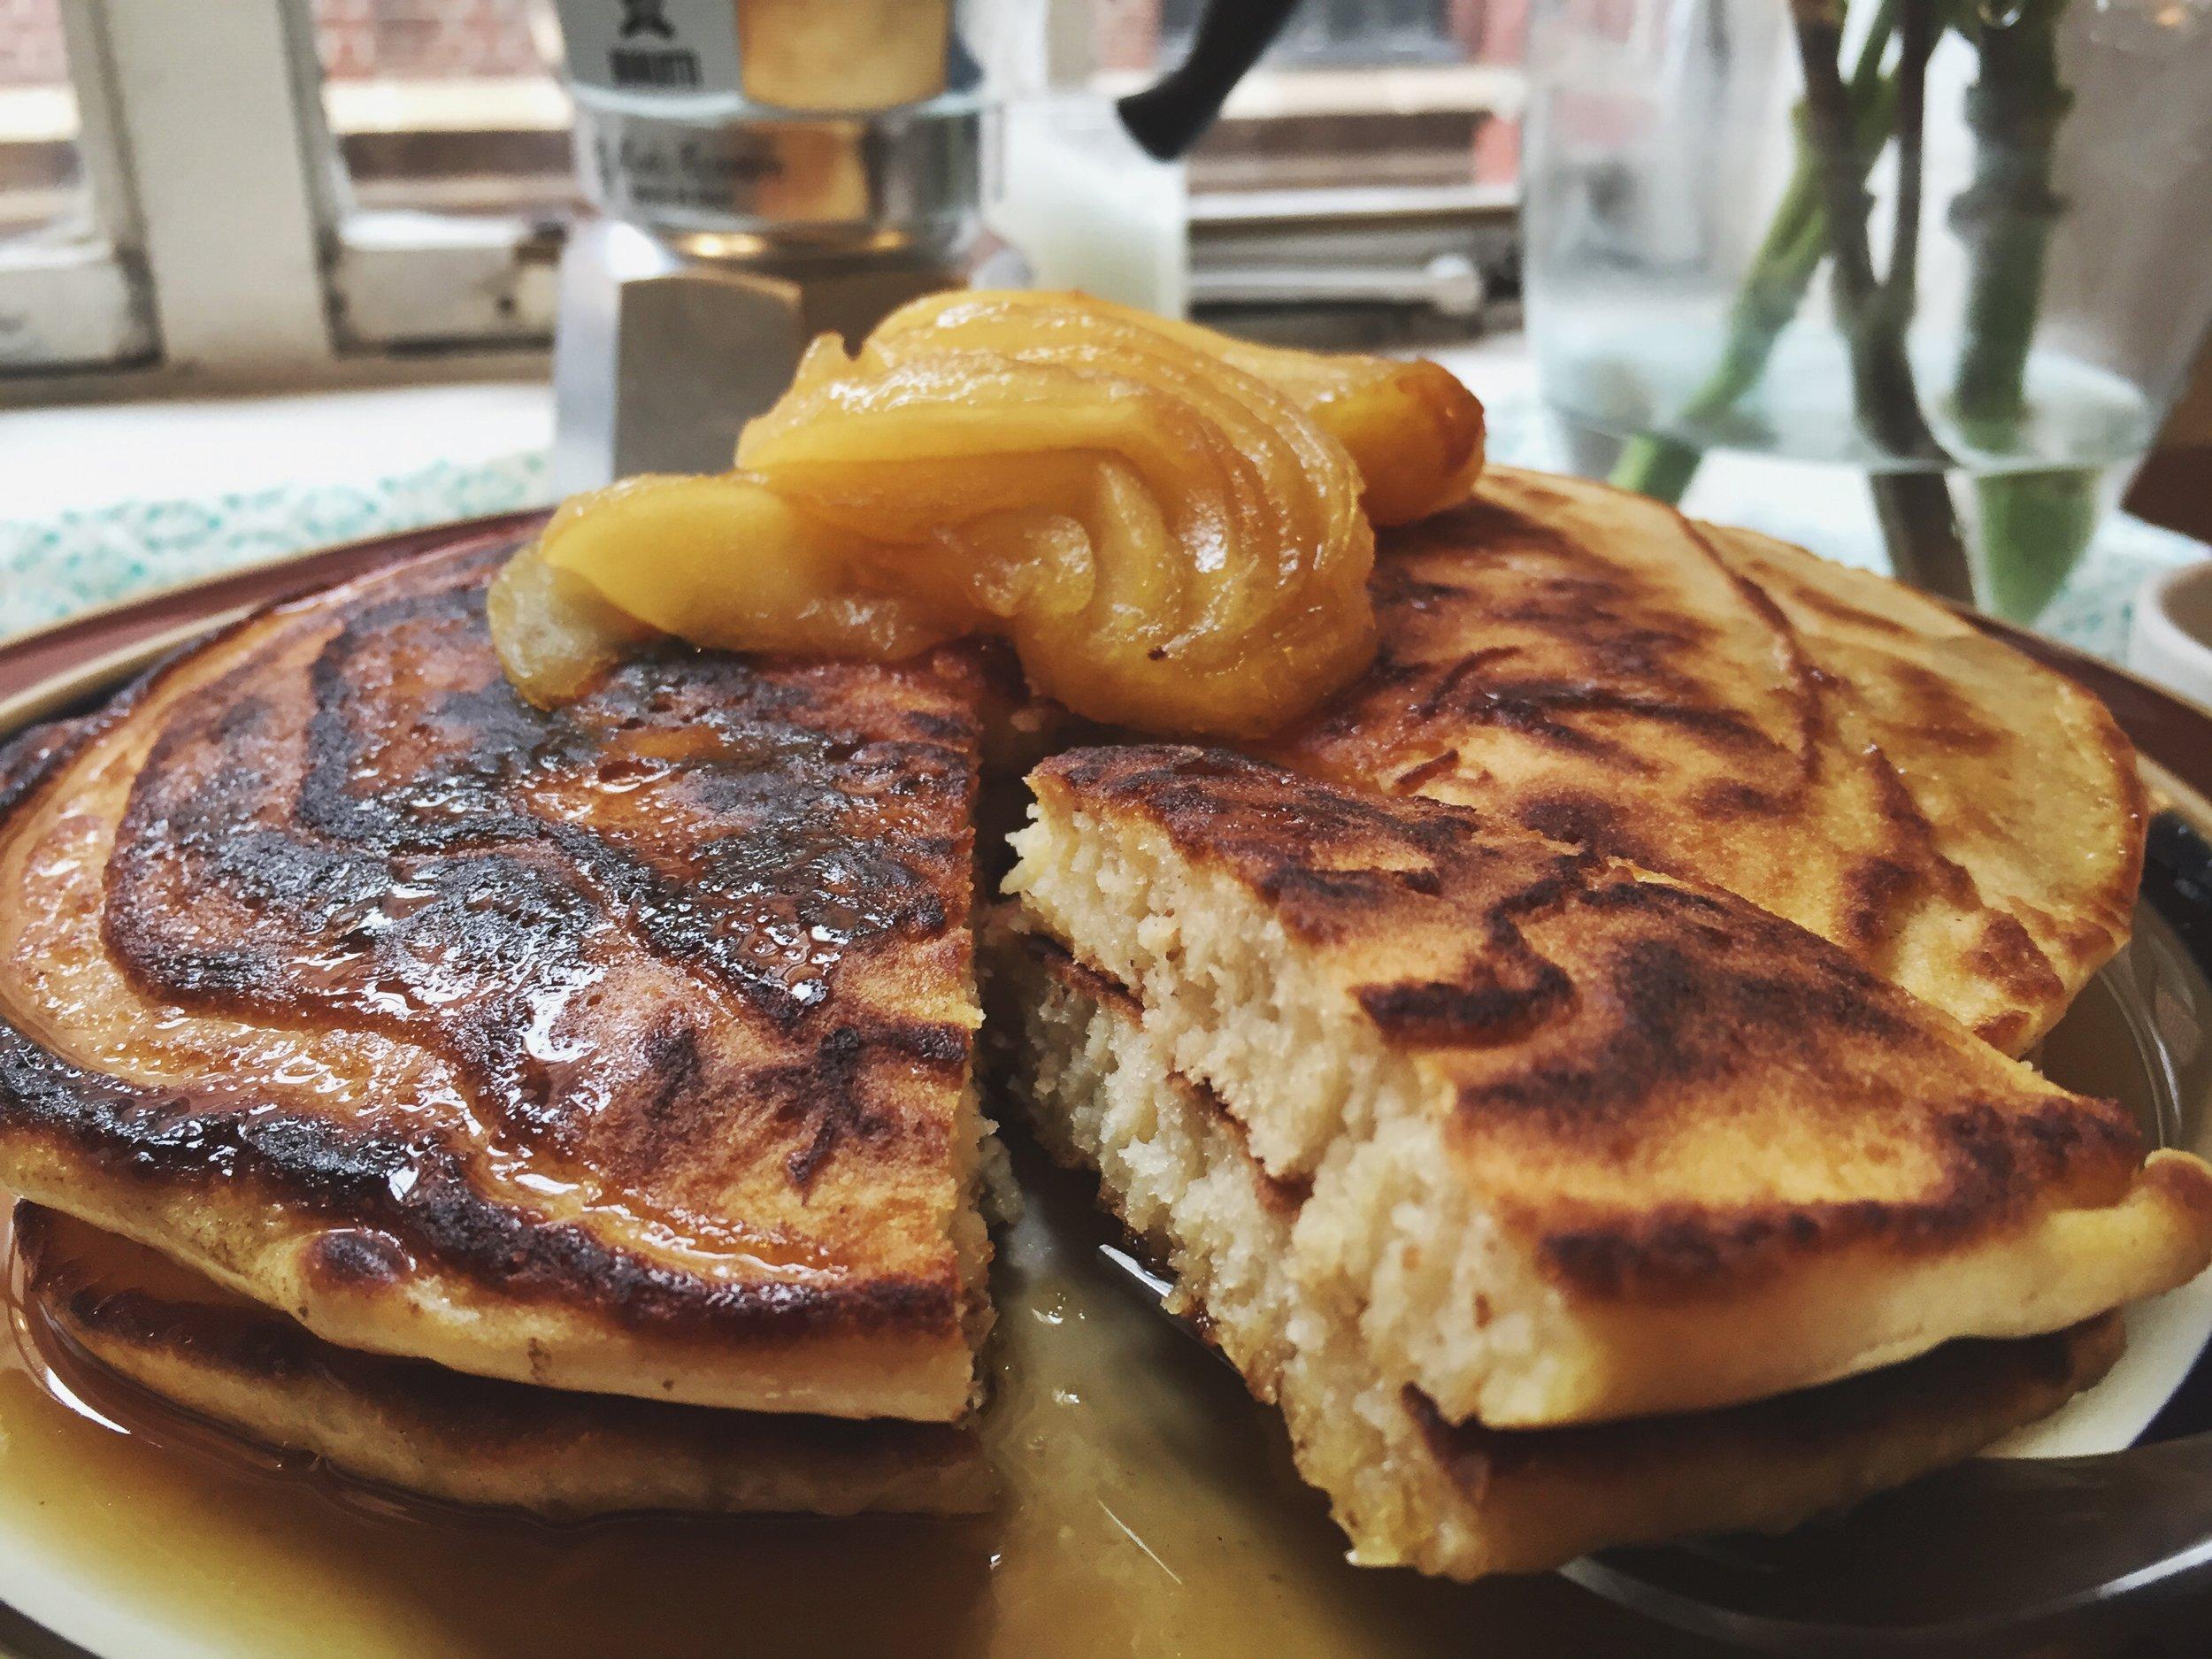 clinton-street-baking-co-pancake-maple-syrup-close-cut